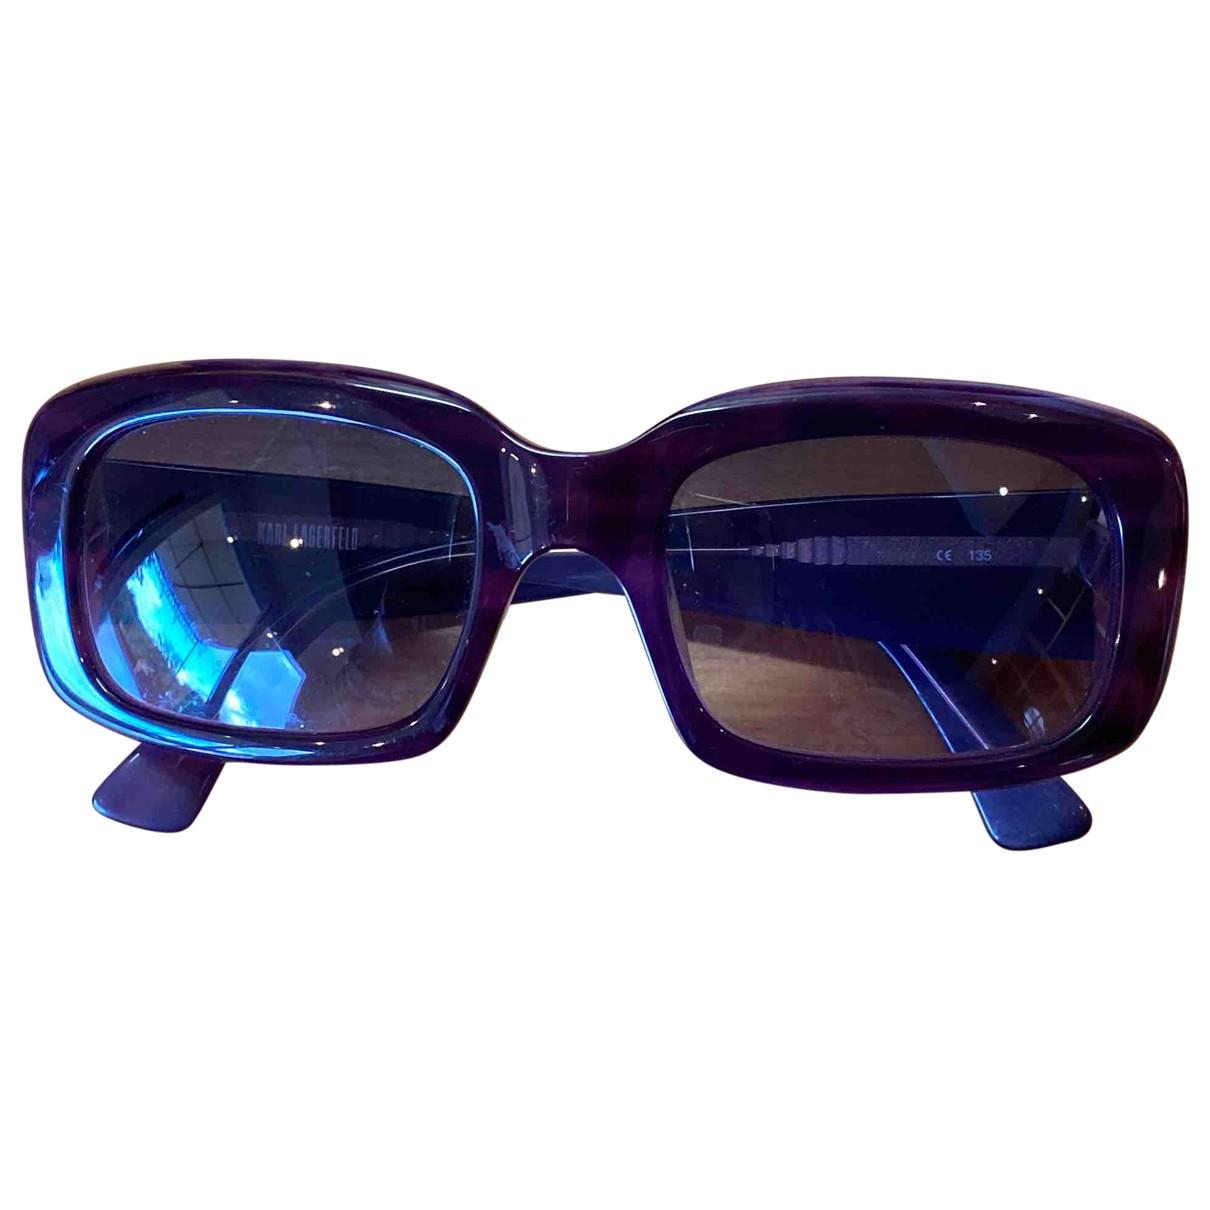 Karl Lagerfeld - Lunettes   pour femme - violet